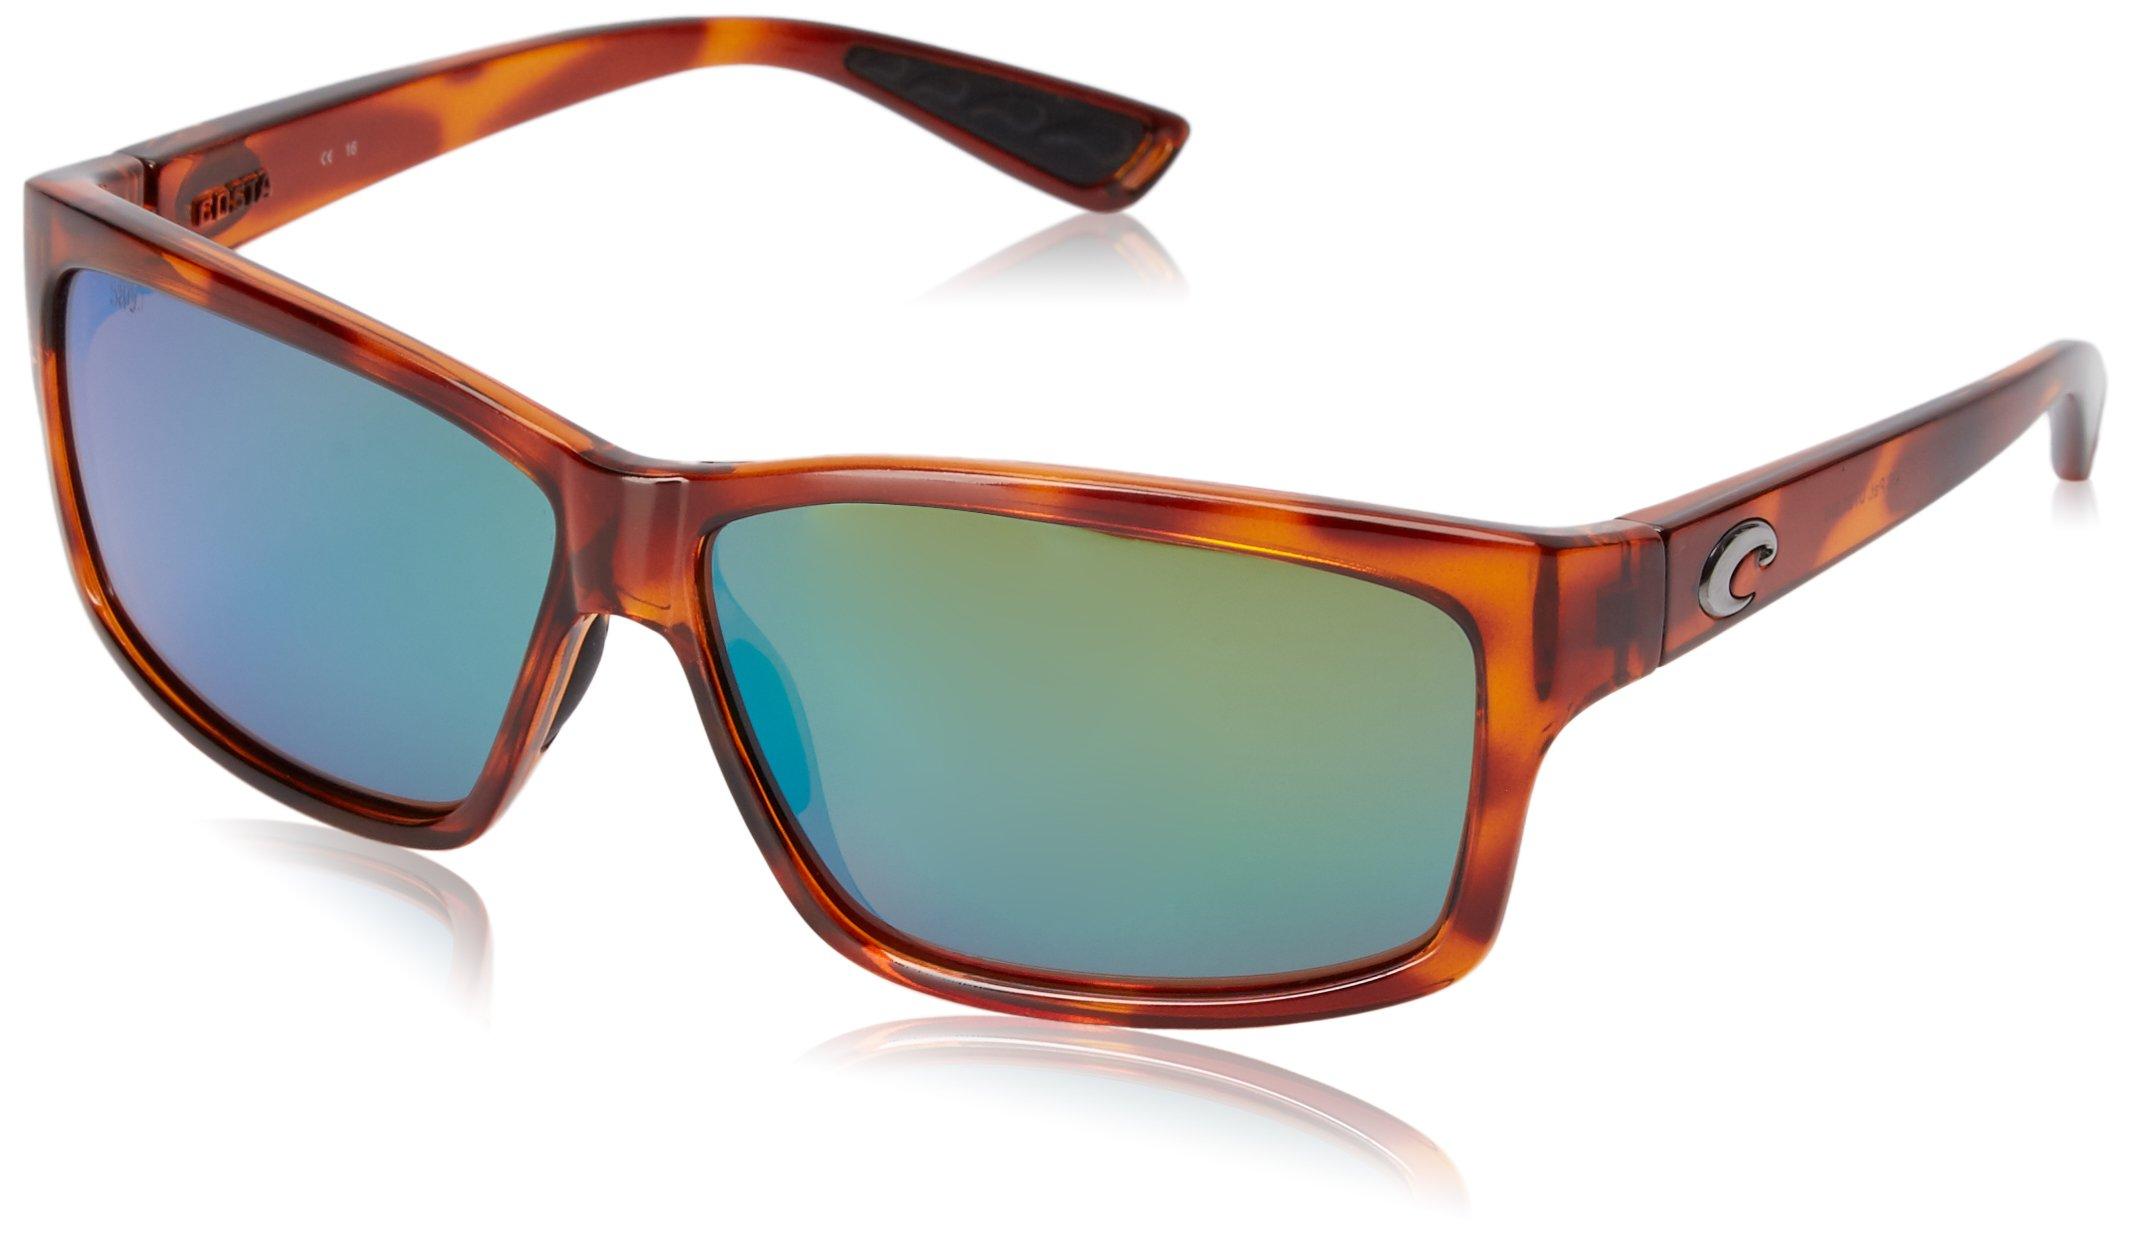 Costa del Mar Cut Polarized Rectangular Sunglasses, Honey Tortoise/Green Mirror 580 Glass